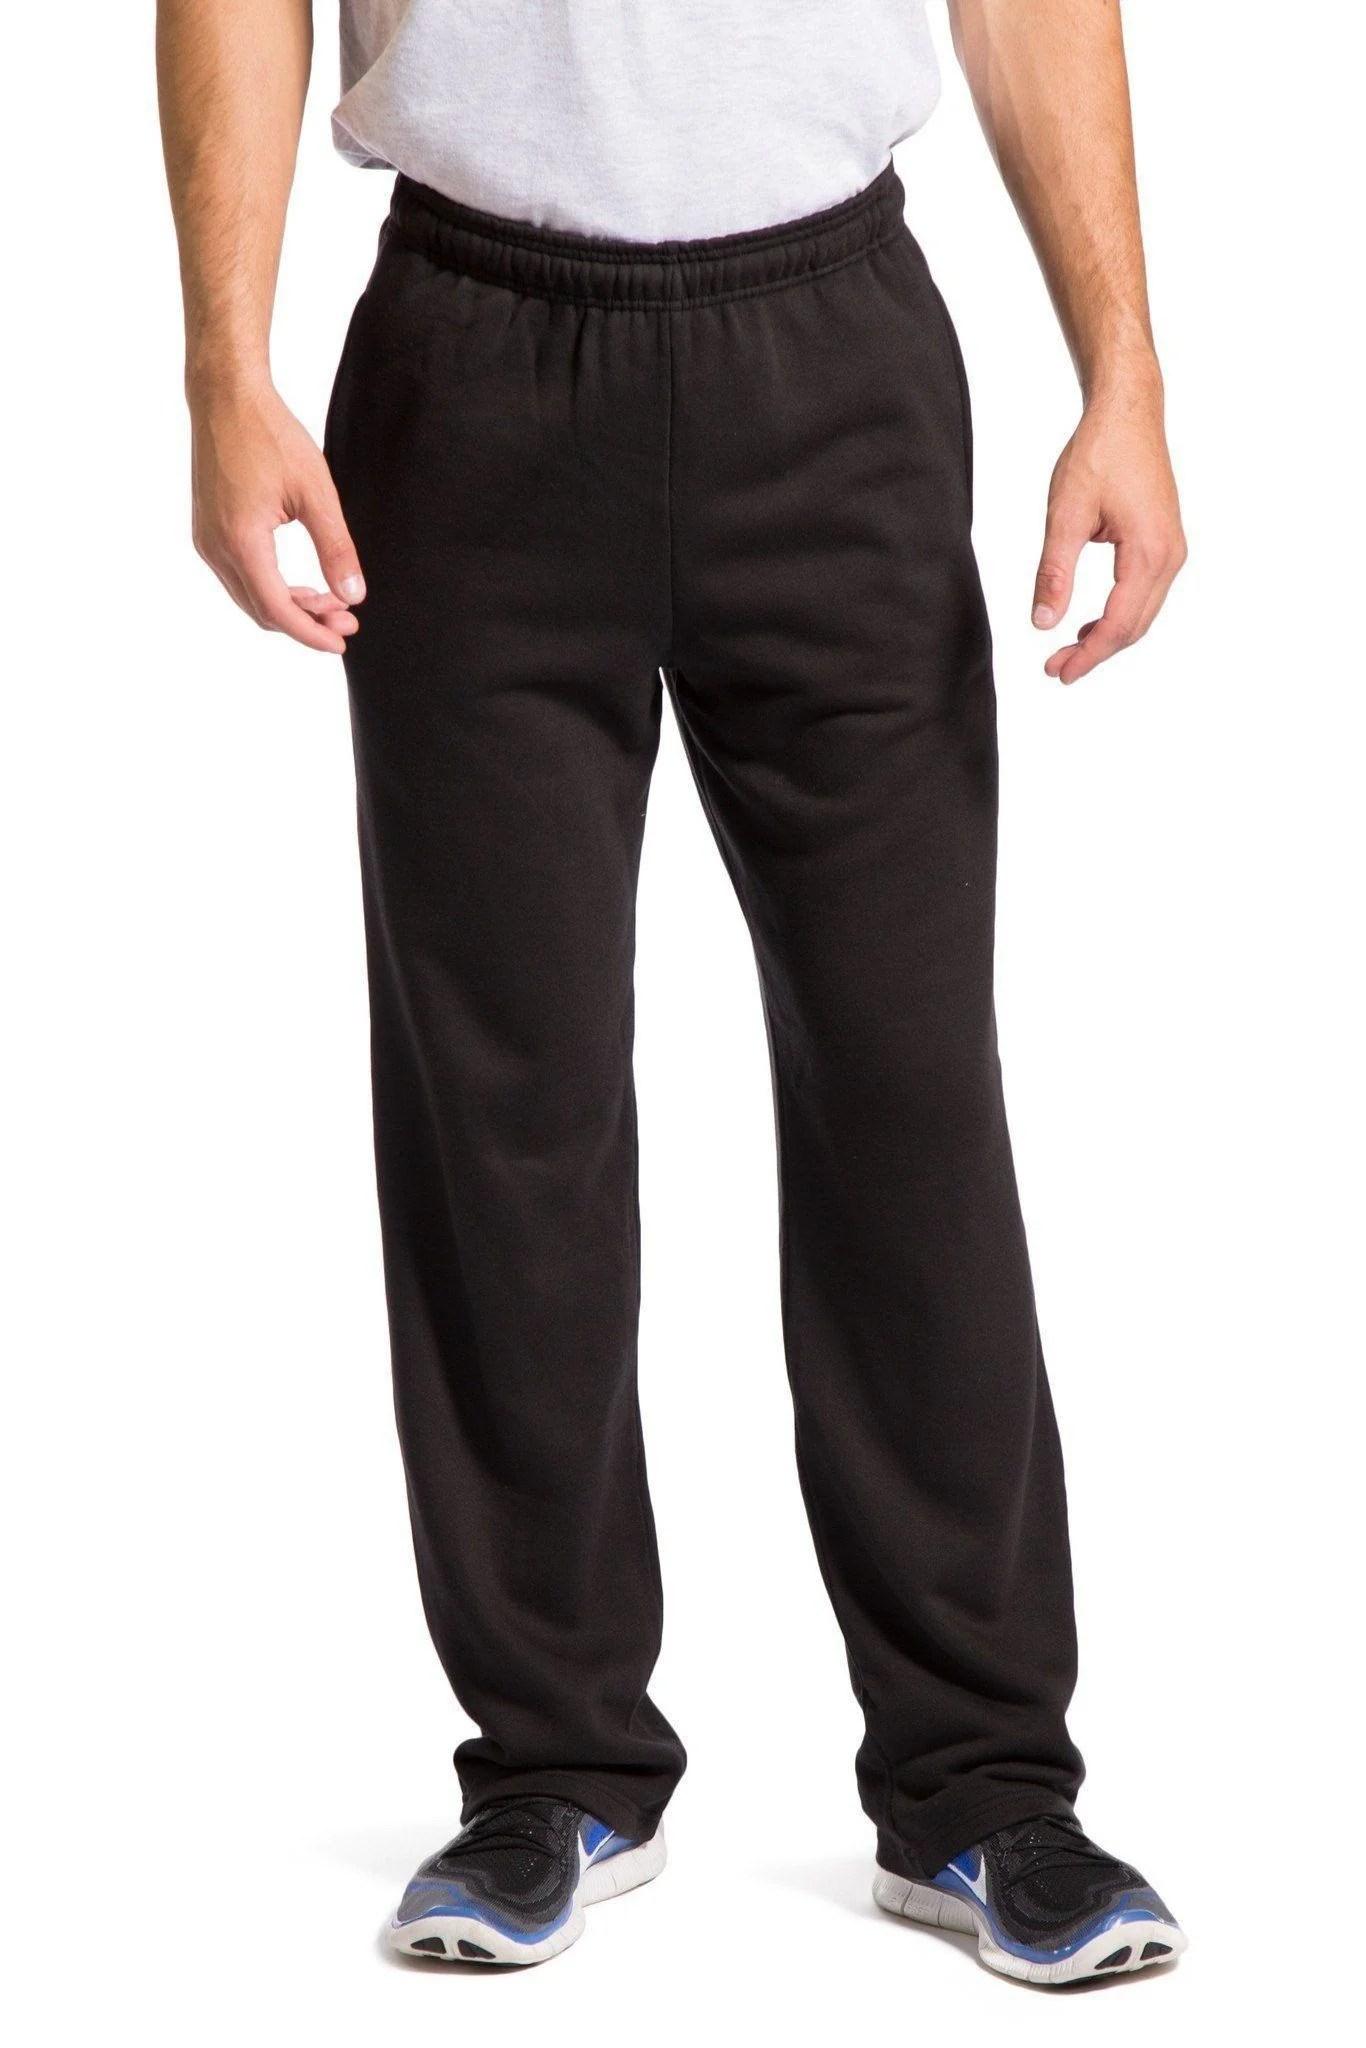 Mens Sweatpants  Ecofrabic Mens Athletic Pants  Fishers